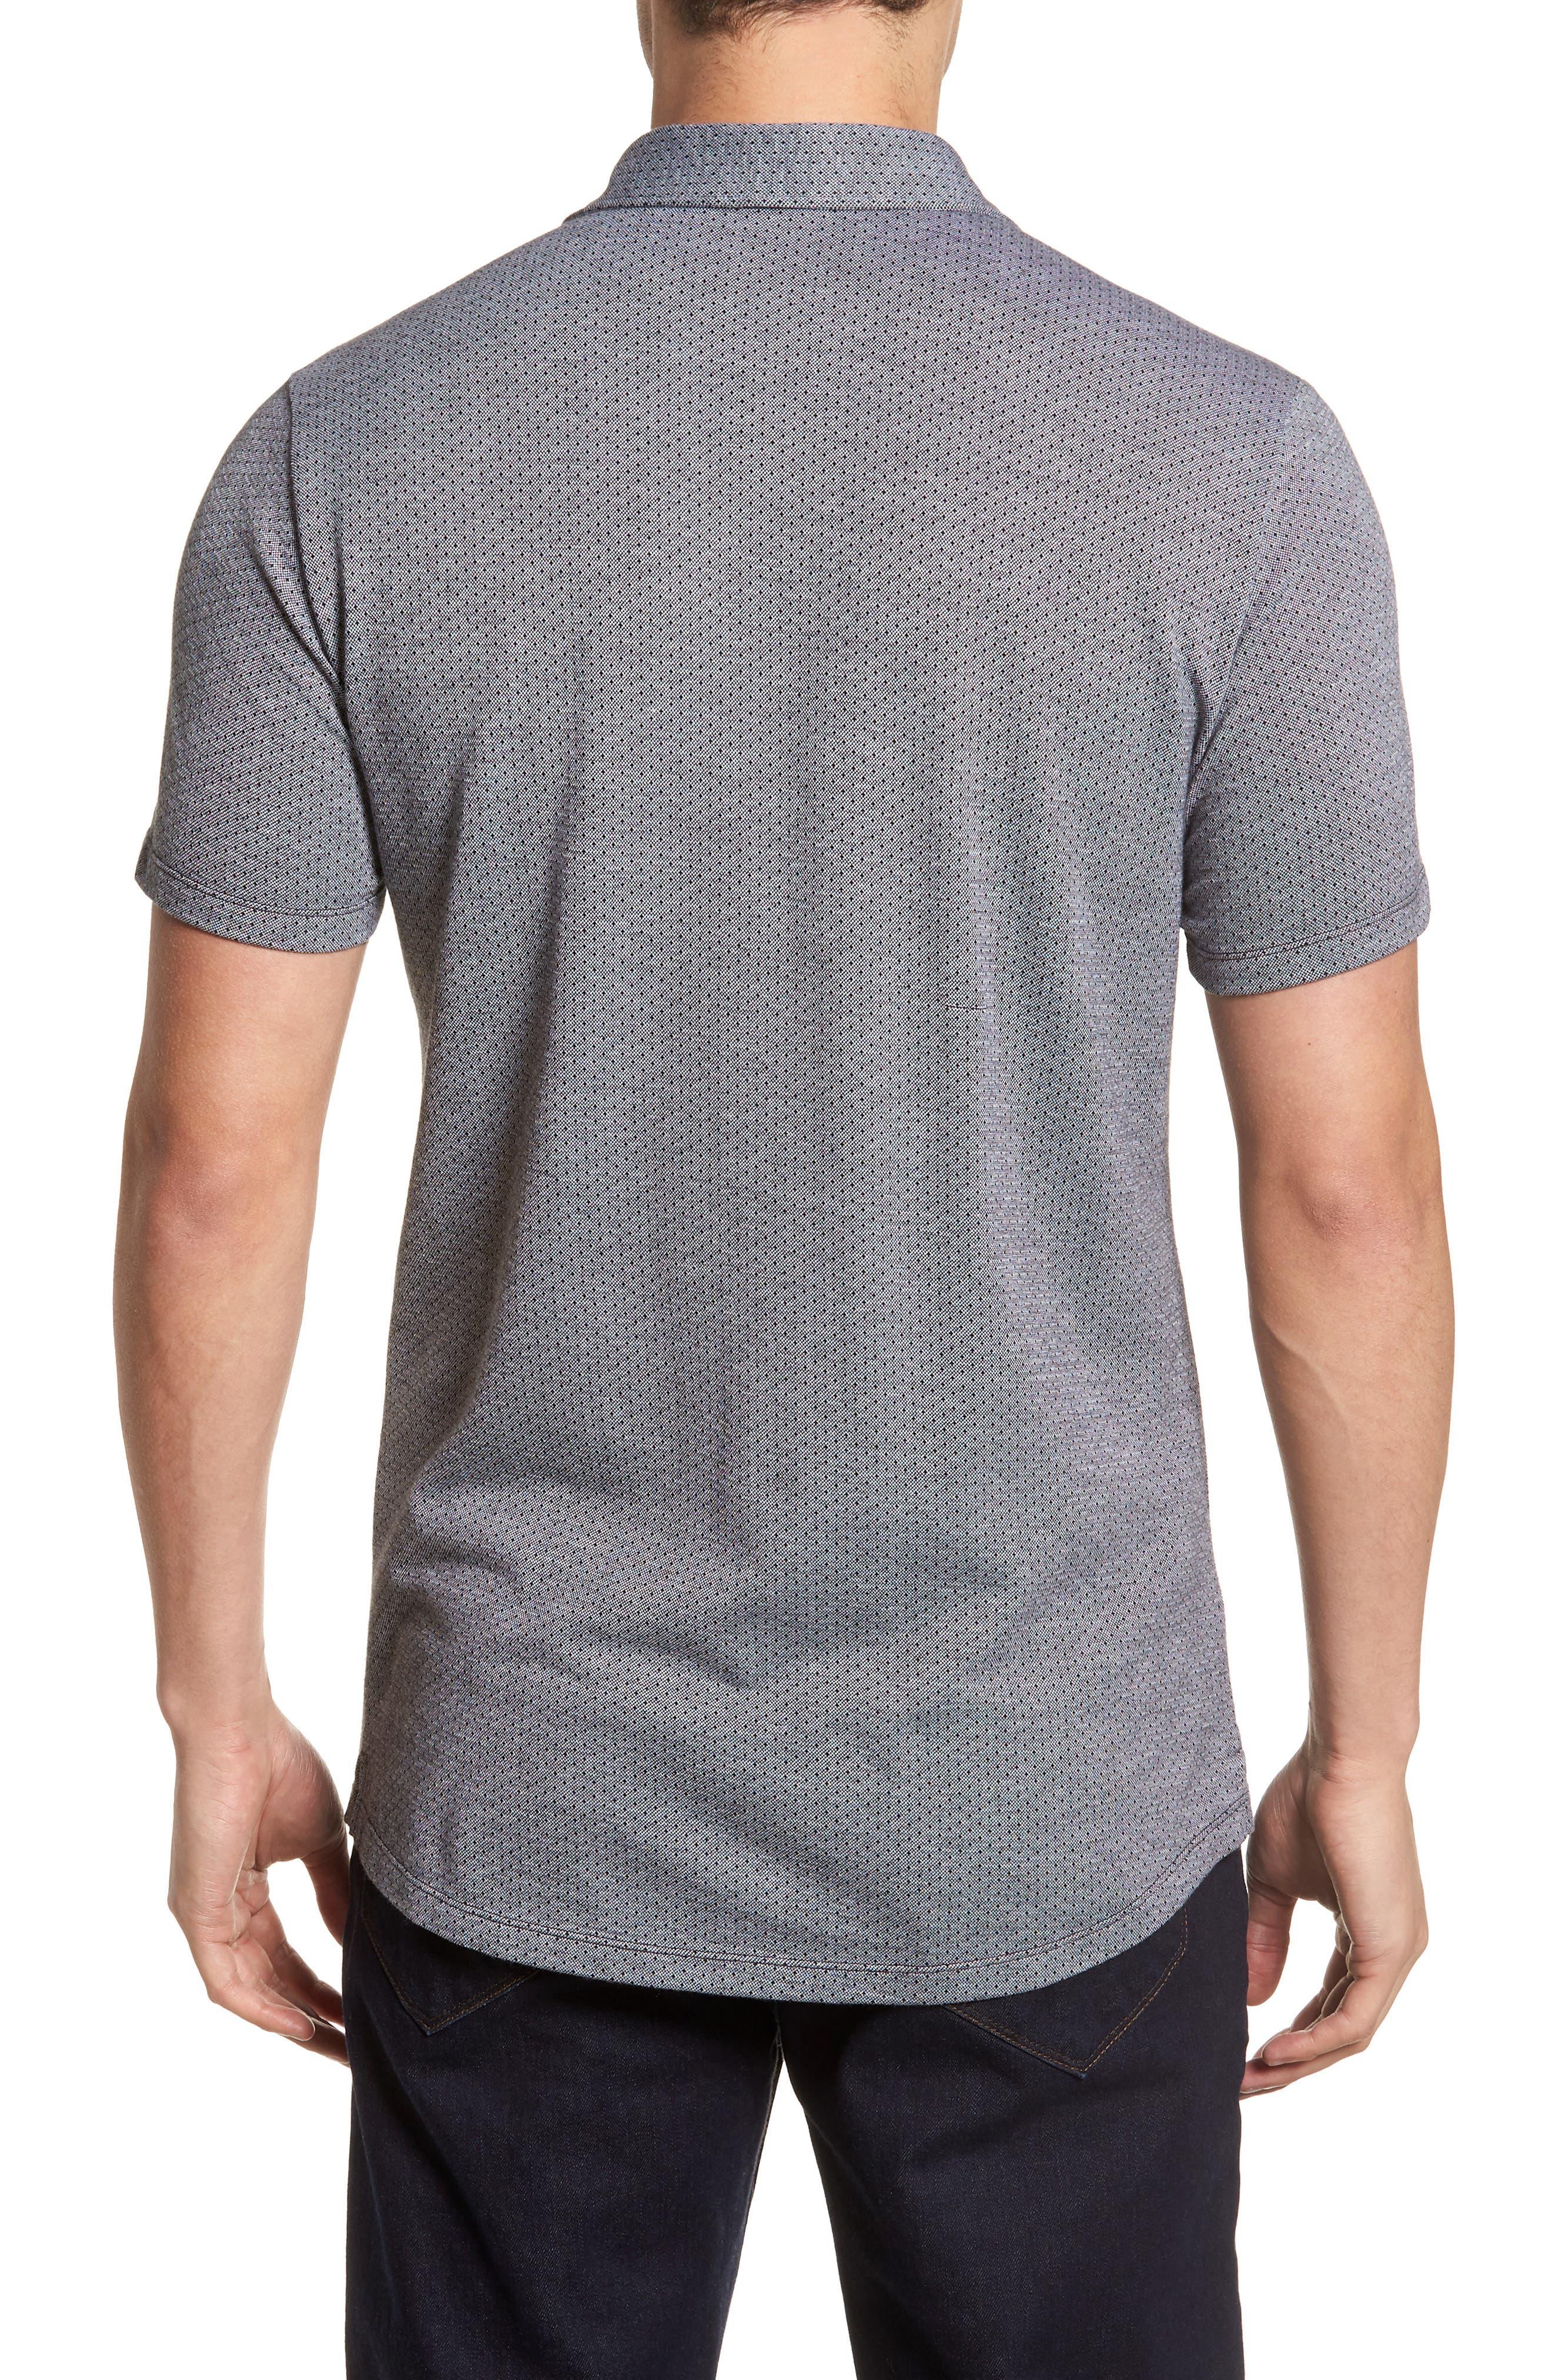 Johnson Sport Shirt,                             Alternate thumbnail 2, color,                             001